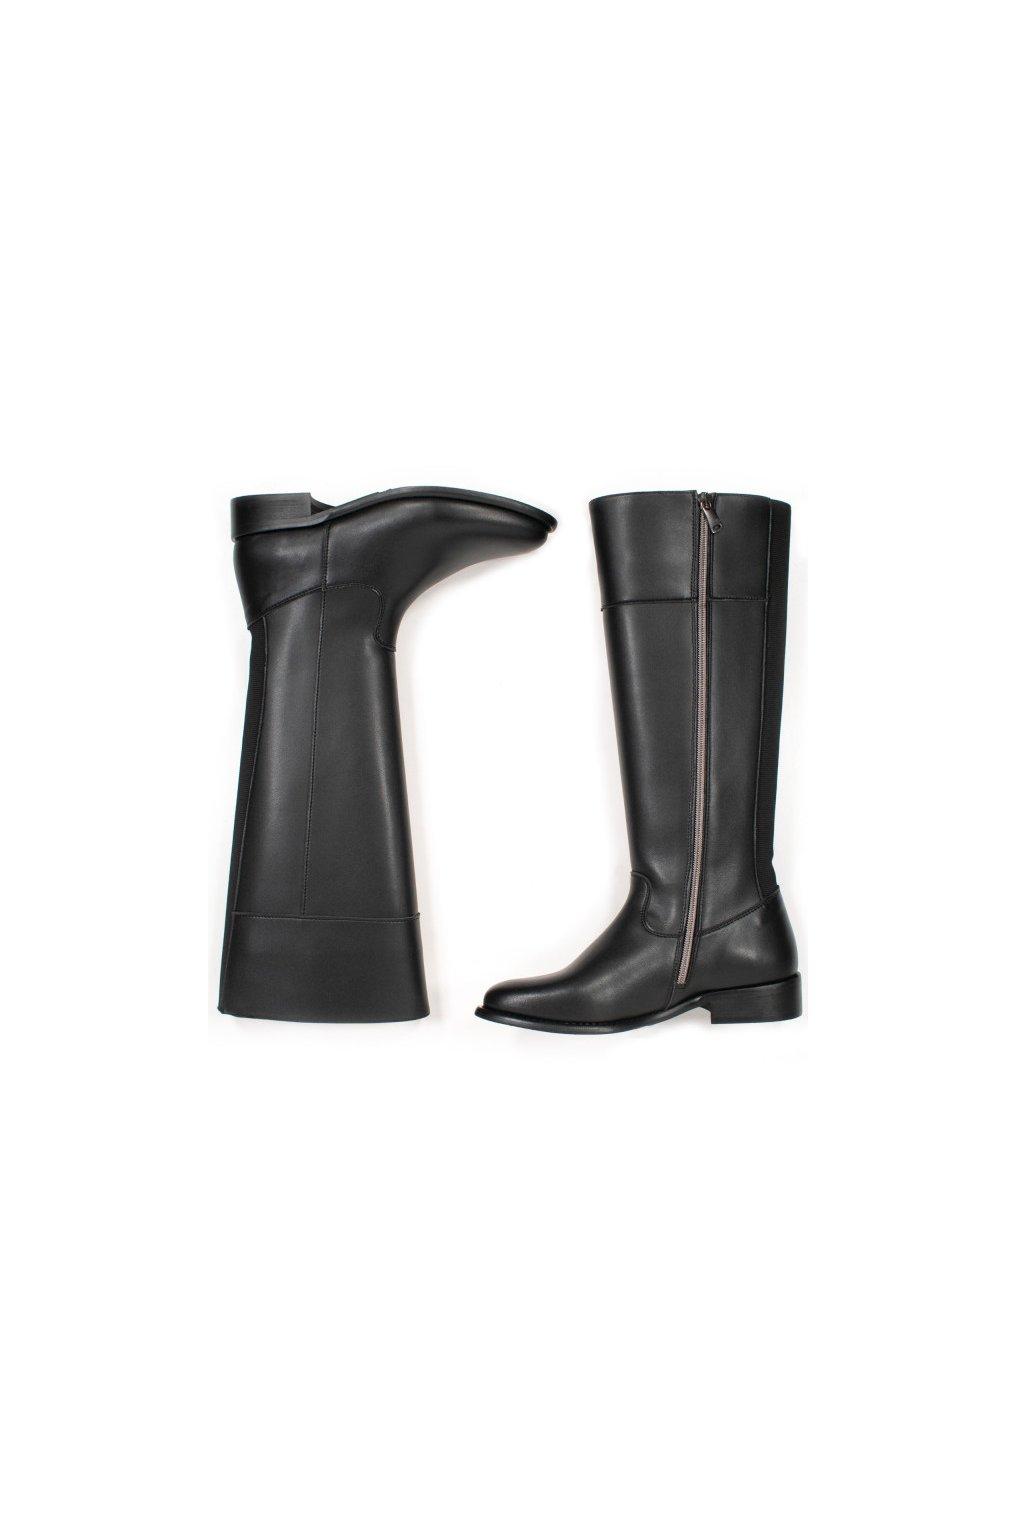 "Dámske čierne čižmy z biooleja ""Knee High Boots"""